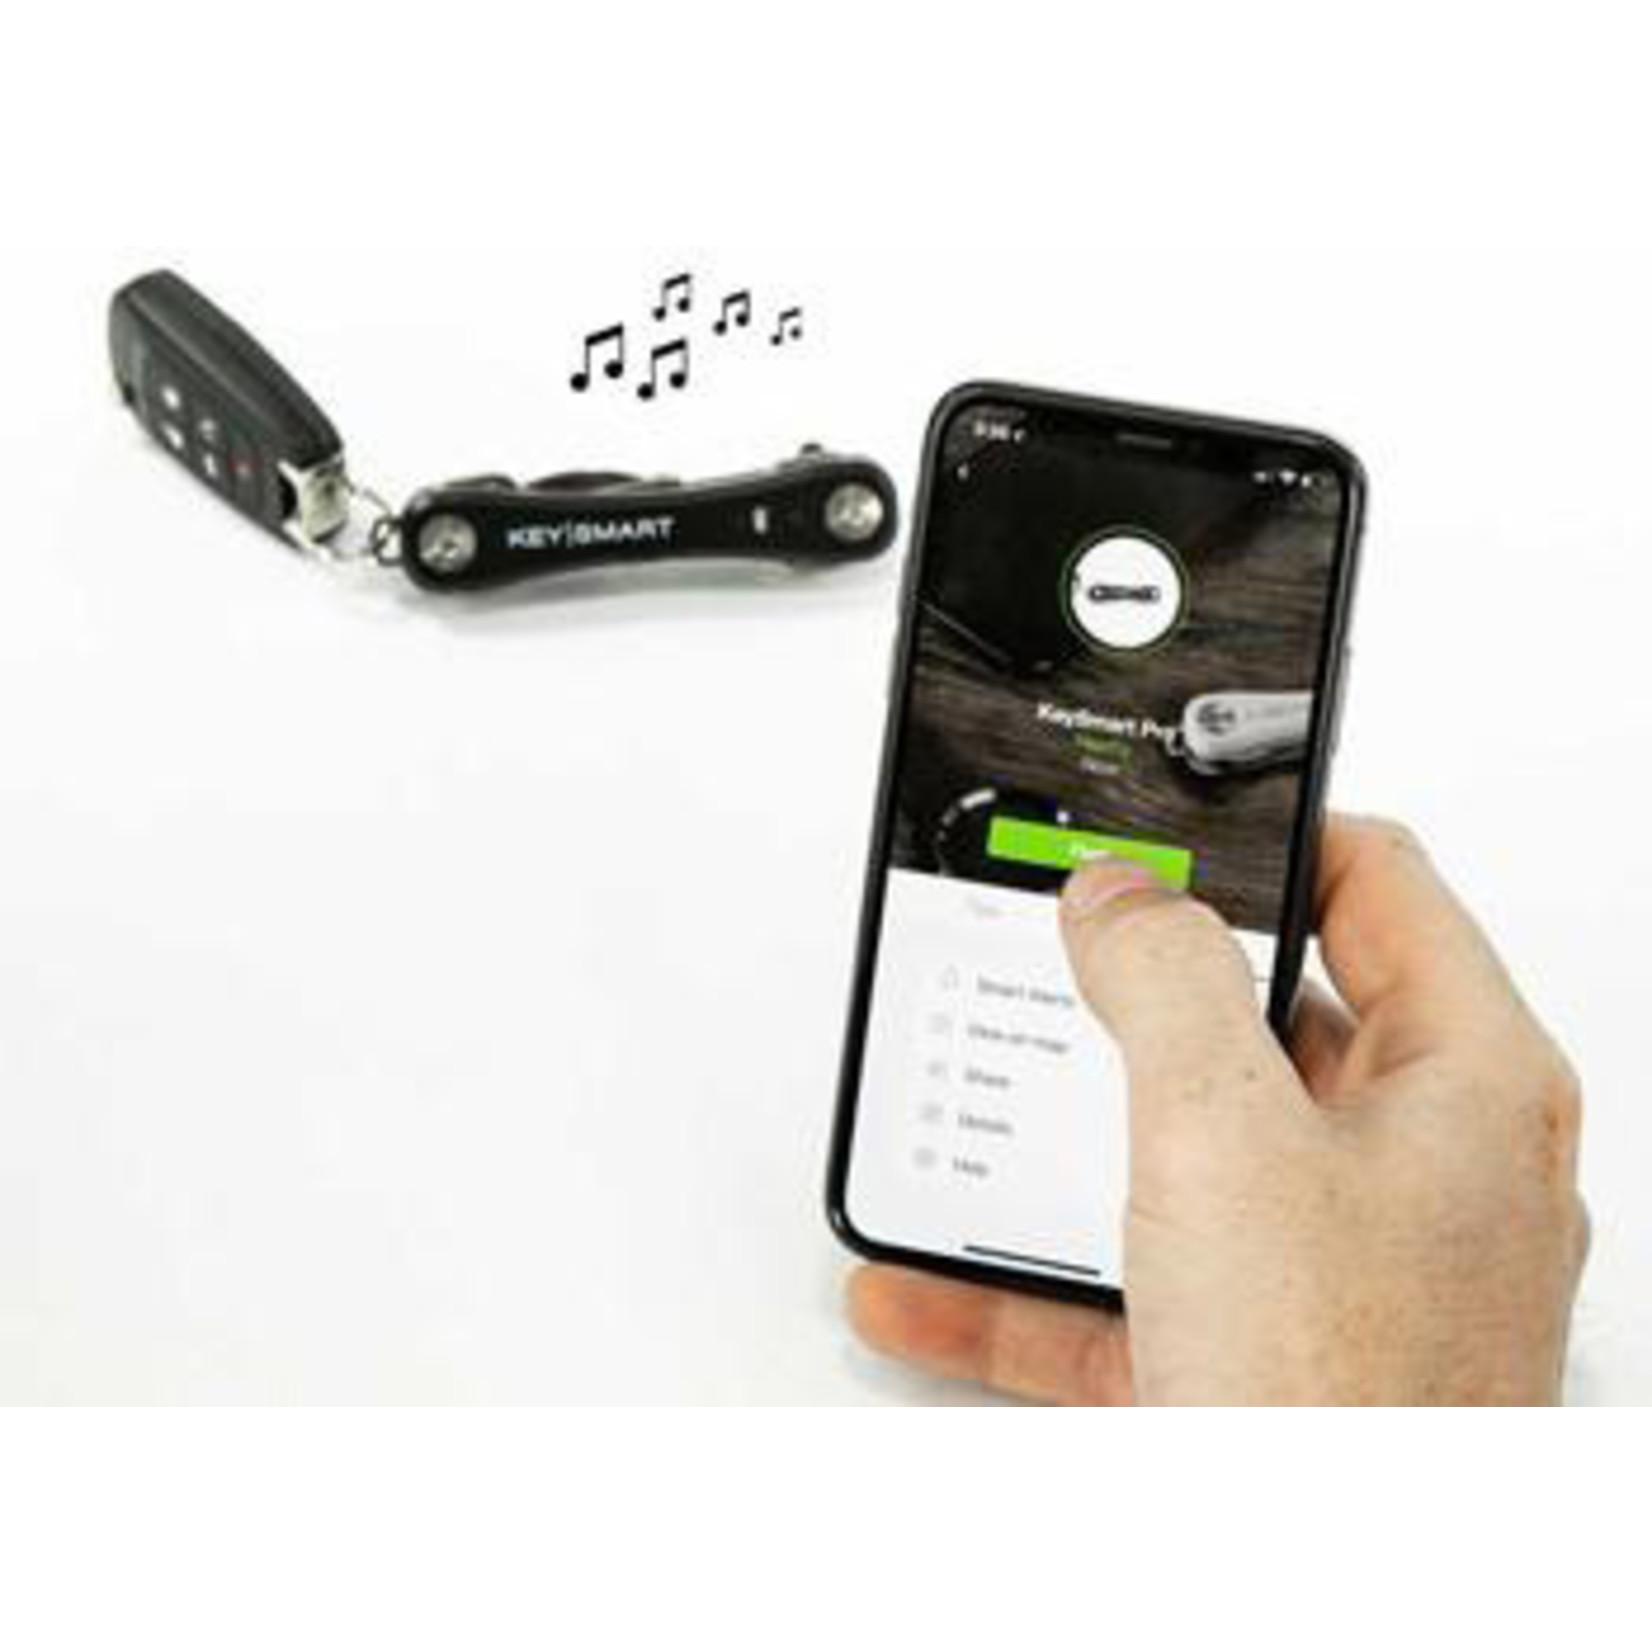 KeySmart KeySmart Pro sleutelhouder met Tile Smart zwart